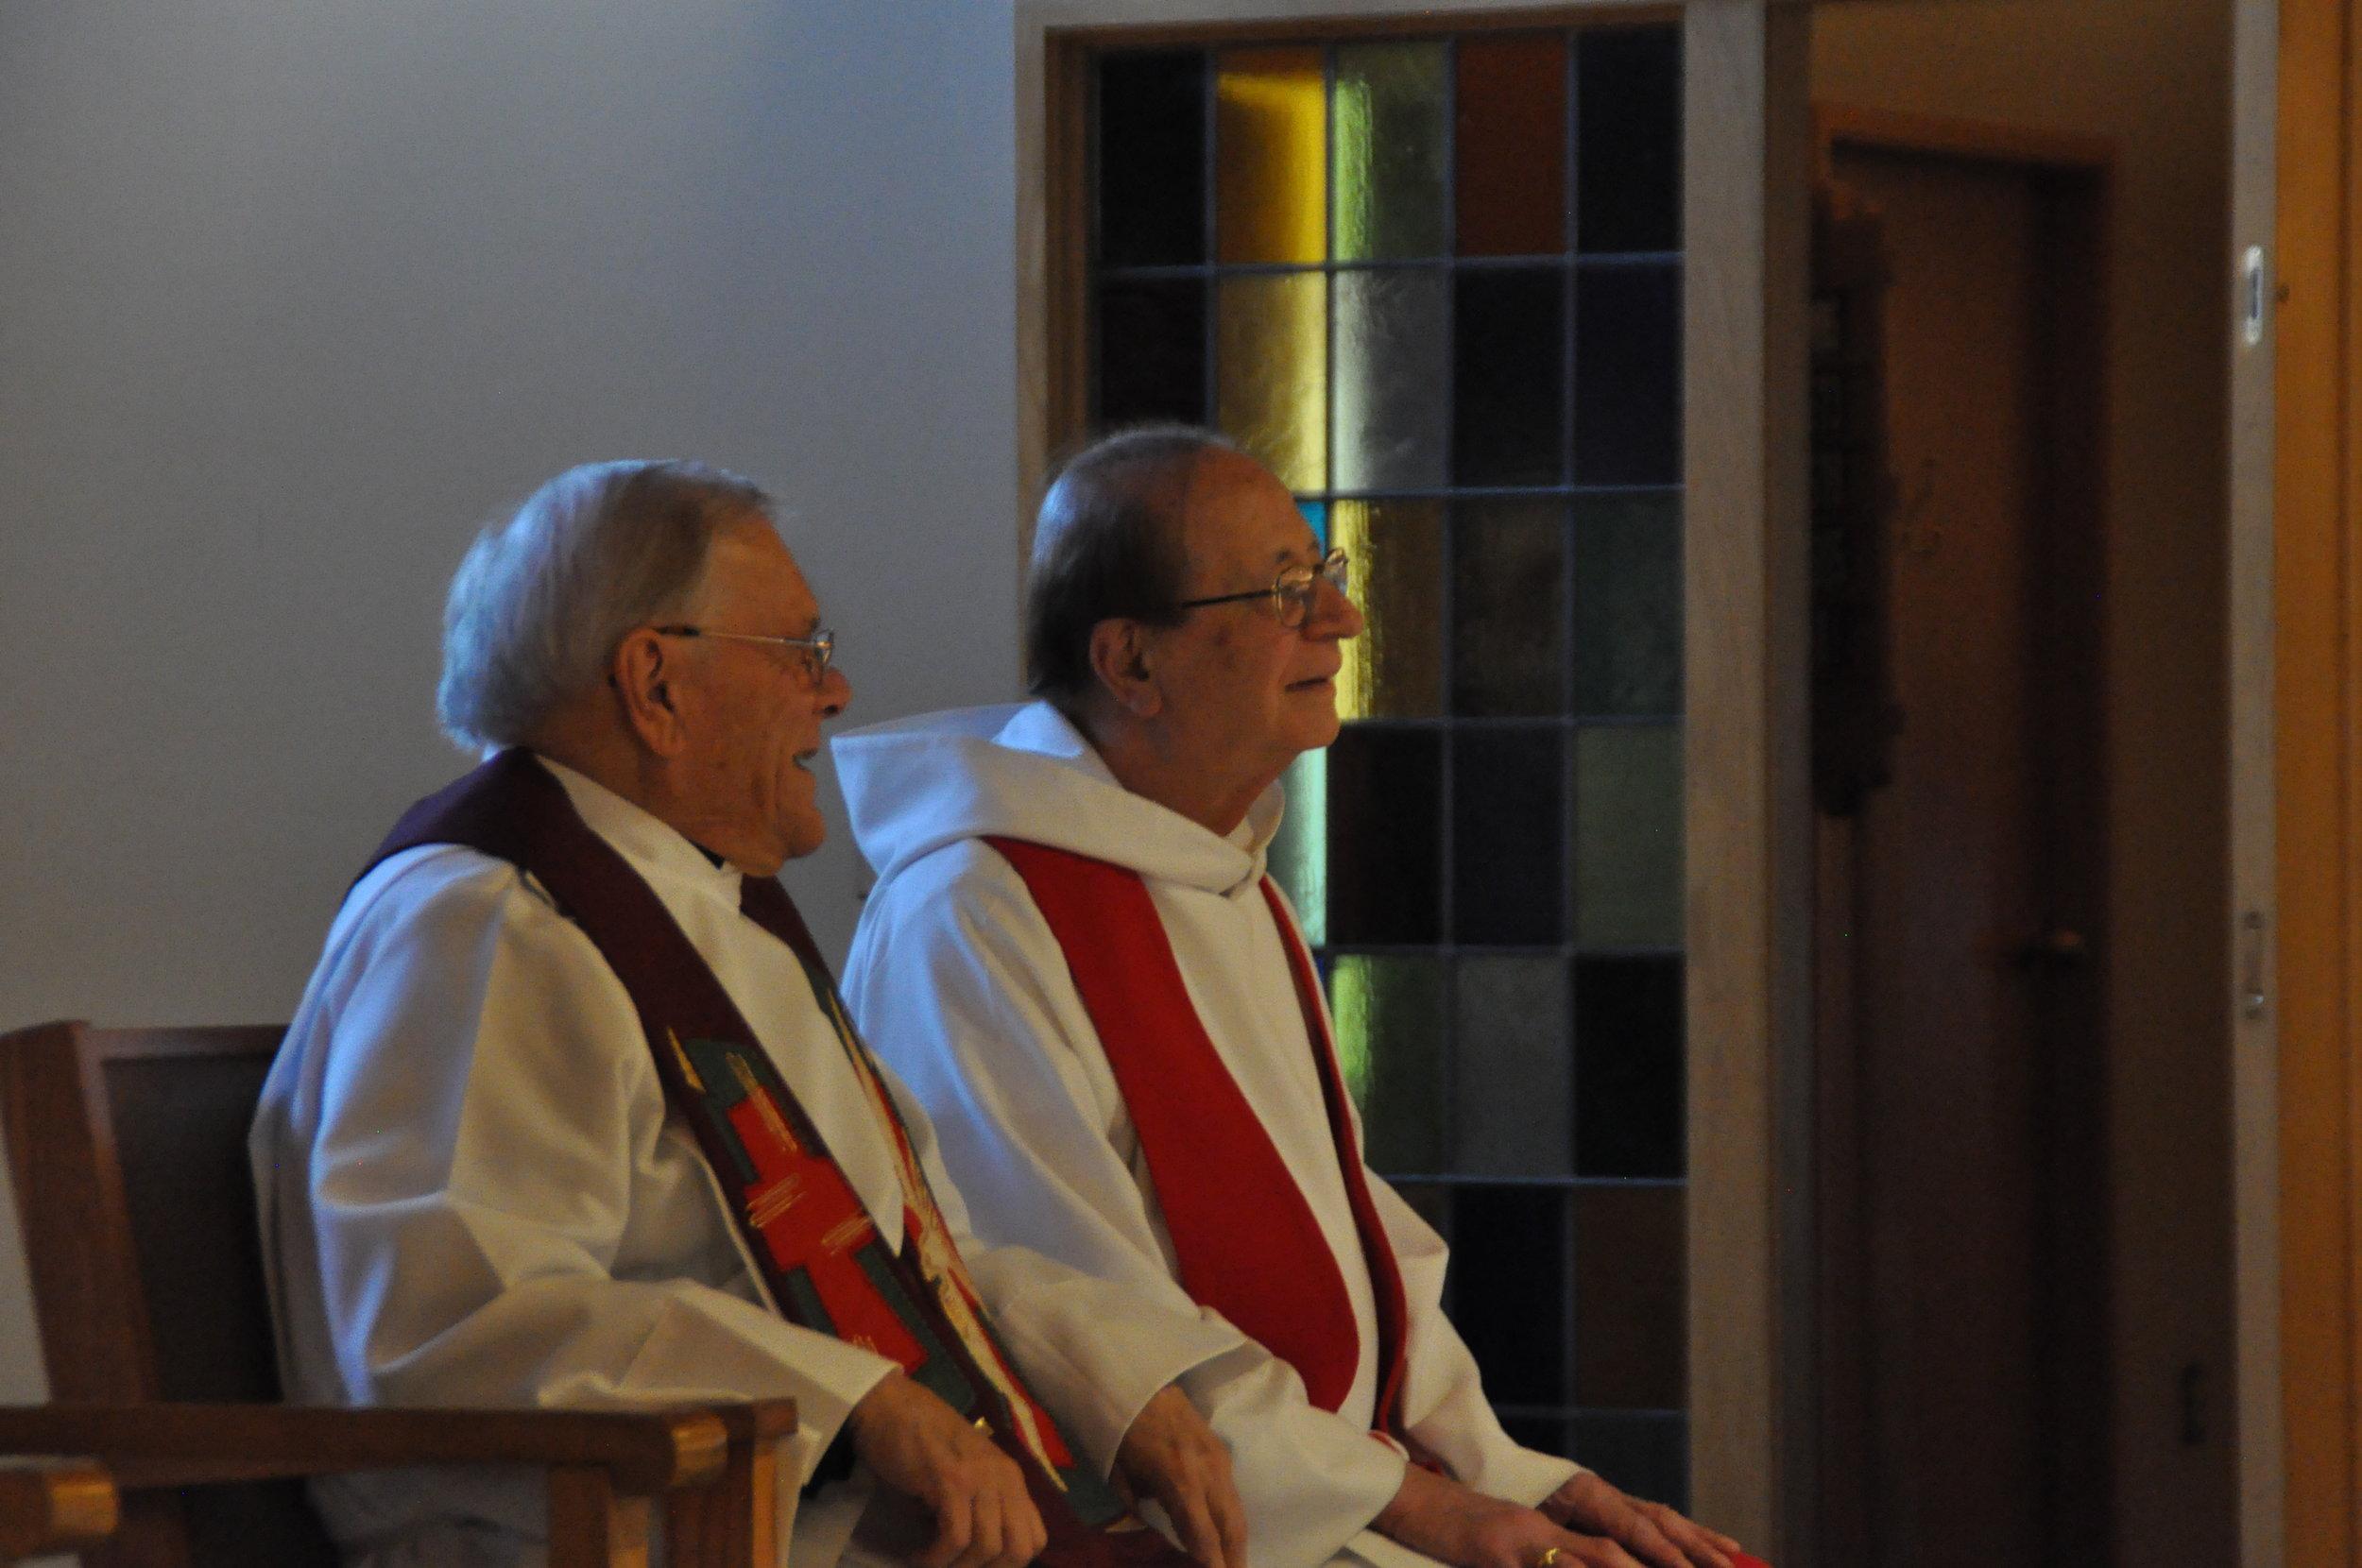 Father Lajack & Father Krizner